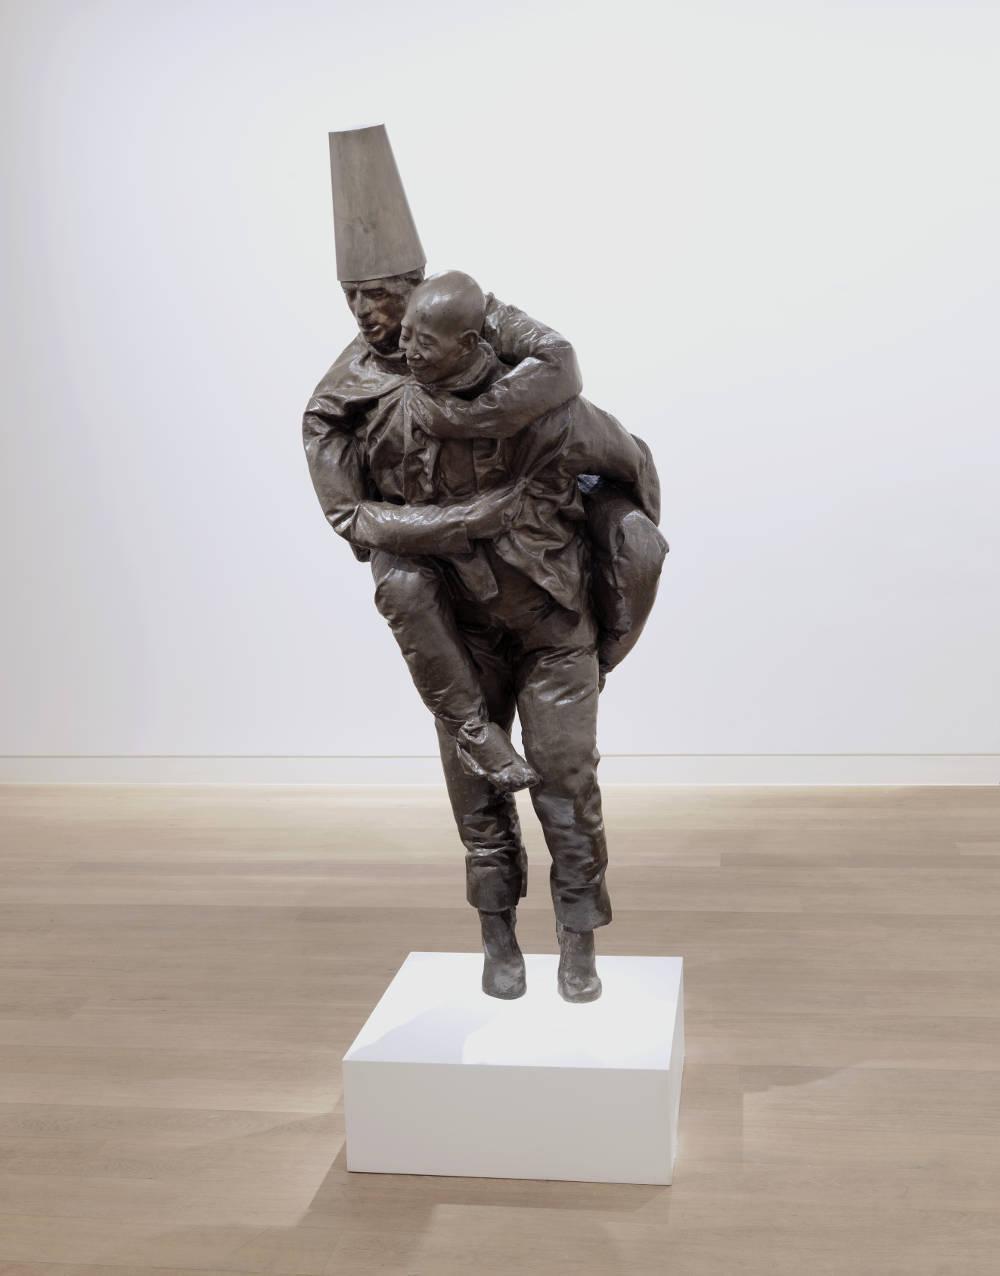 Juan Muñoz, Piggyback (Chinese Down), 1997. Bronze 194,3 x 68,59 x 60,9 cm